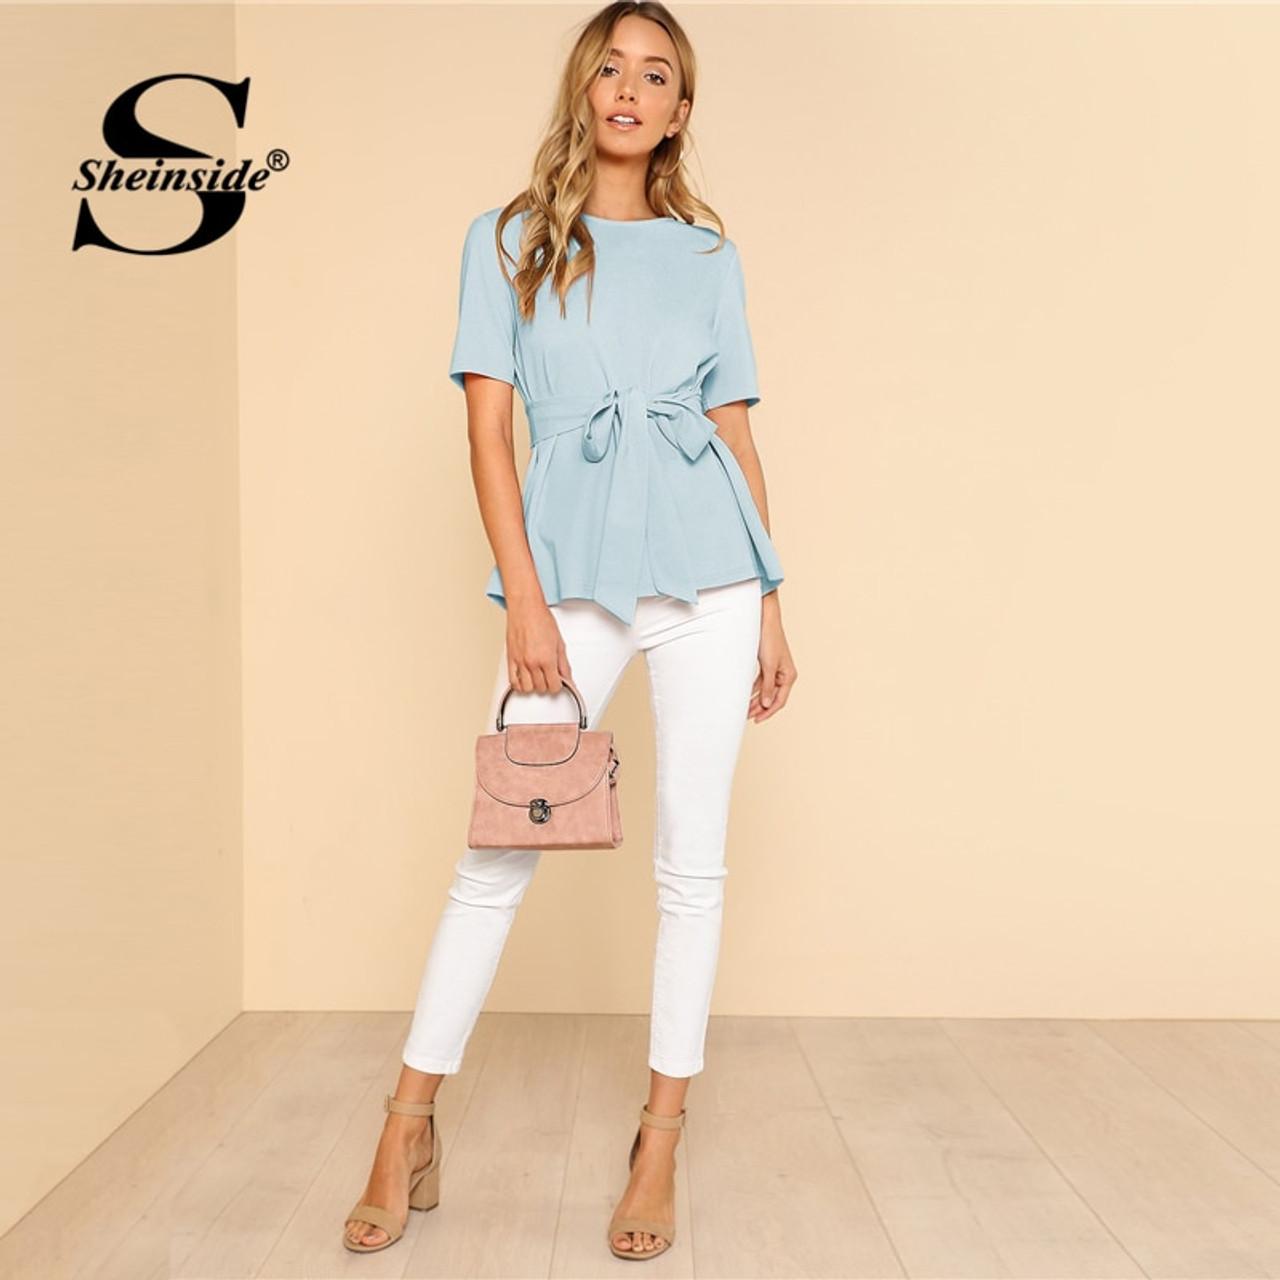 d0dda13e5a ... Sheinside Self Belt Keyhole Back Shirt Short Sleeve Plain Womens Tops  and Blouses Summer Ladies Workwear ...